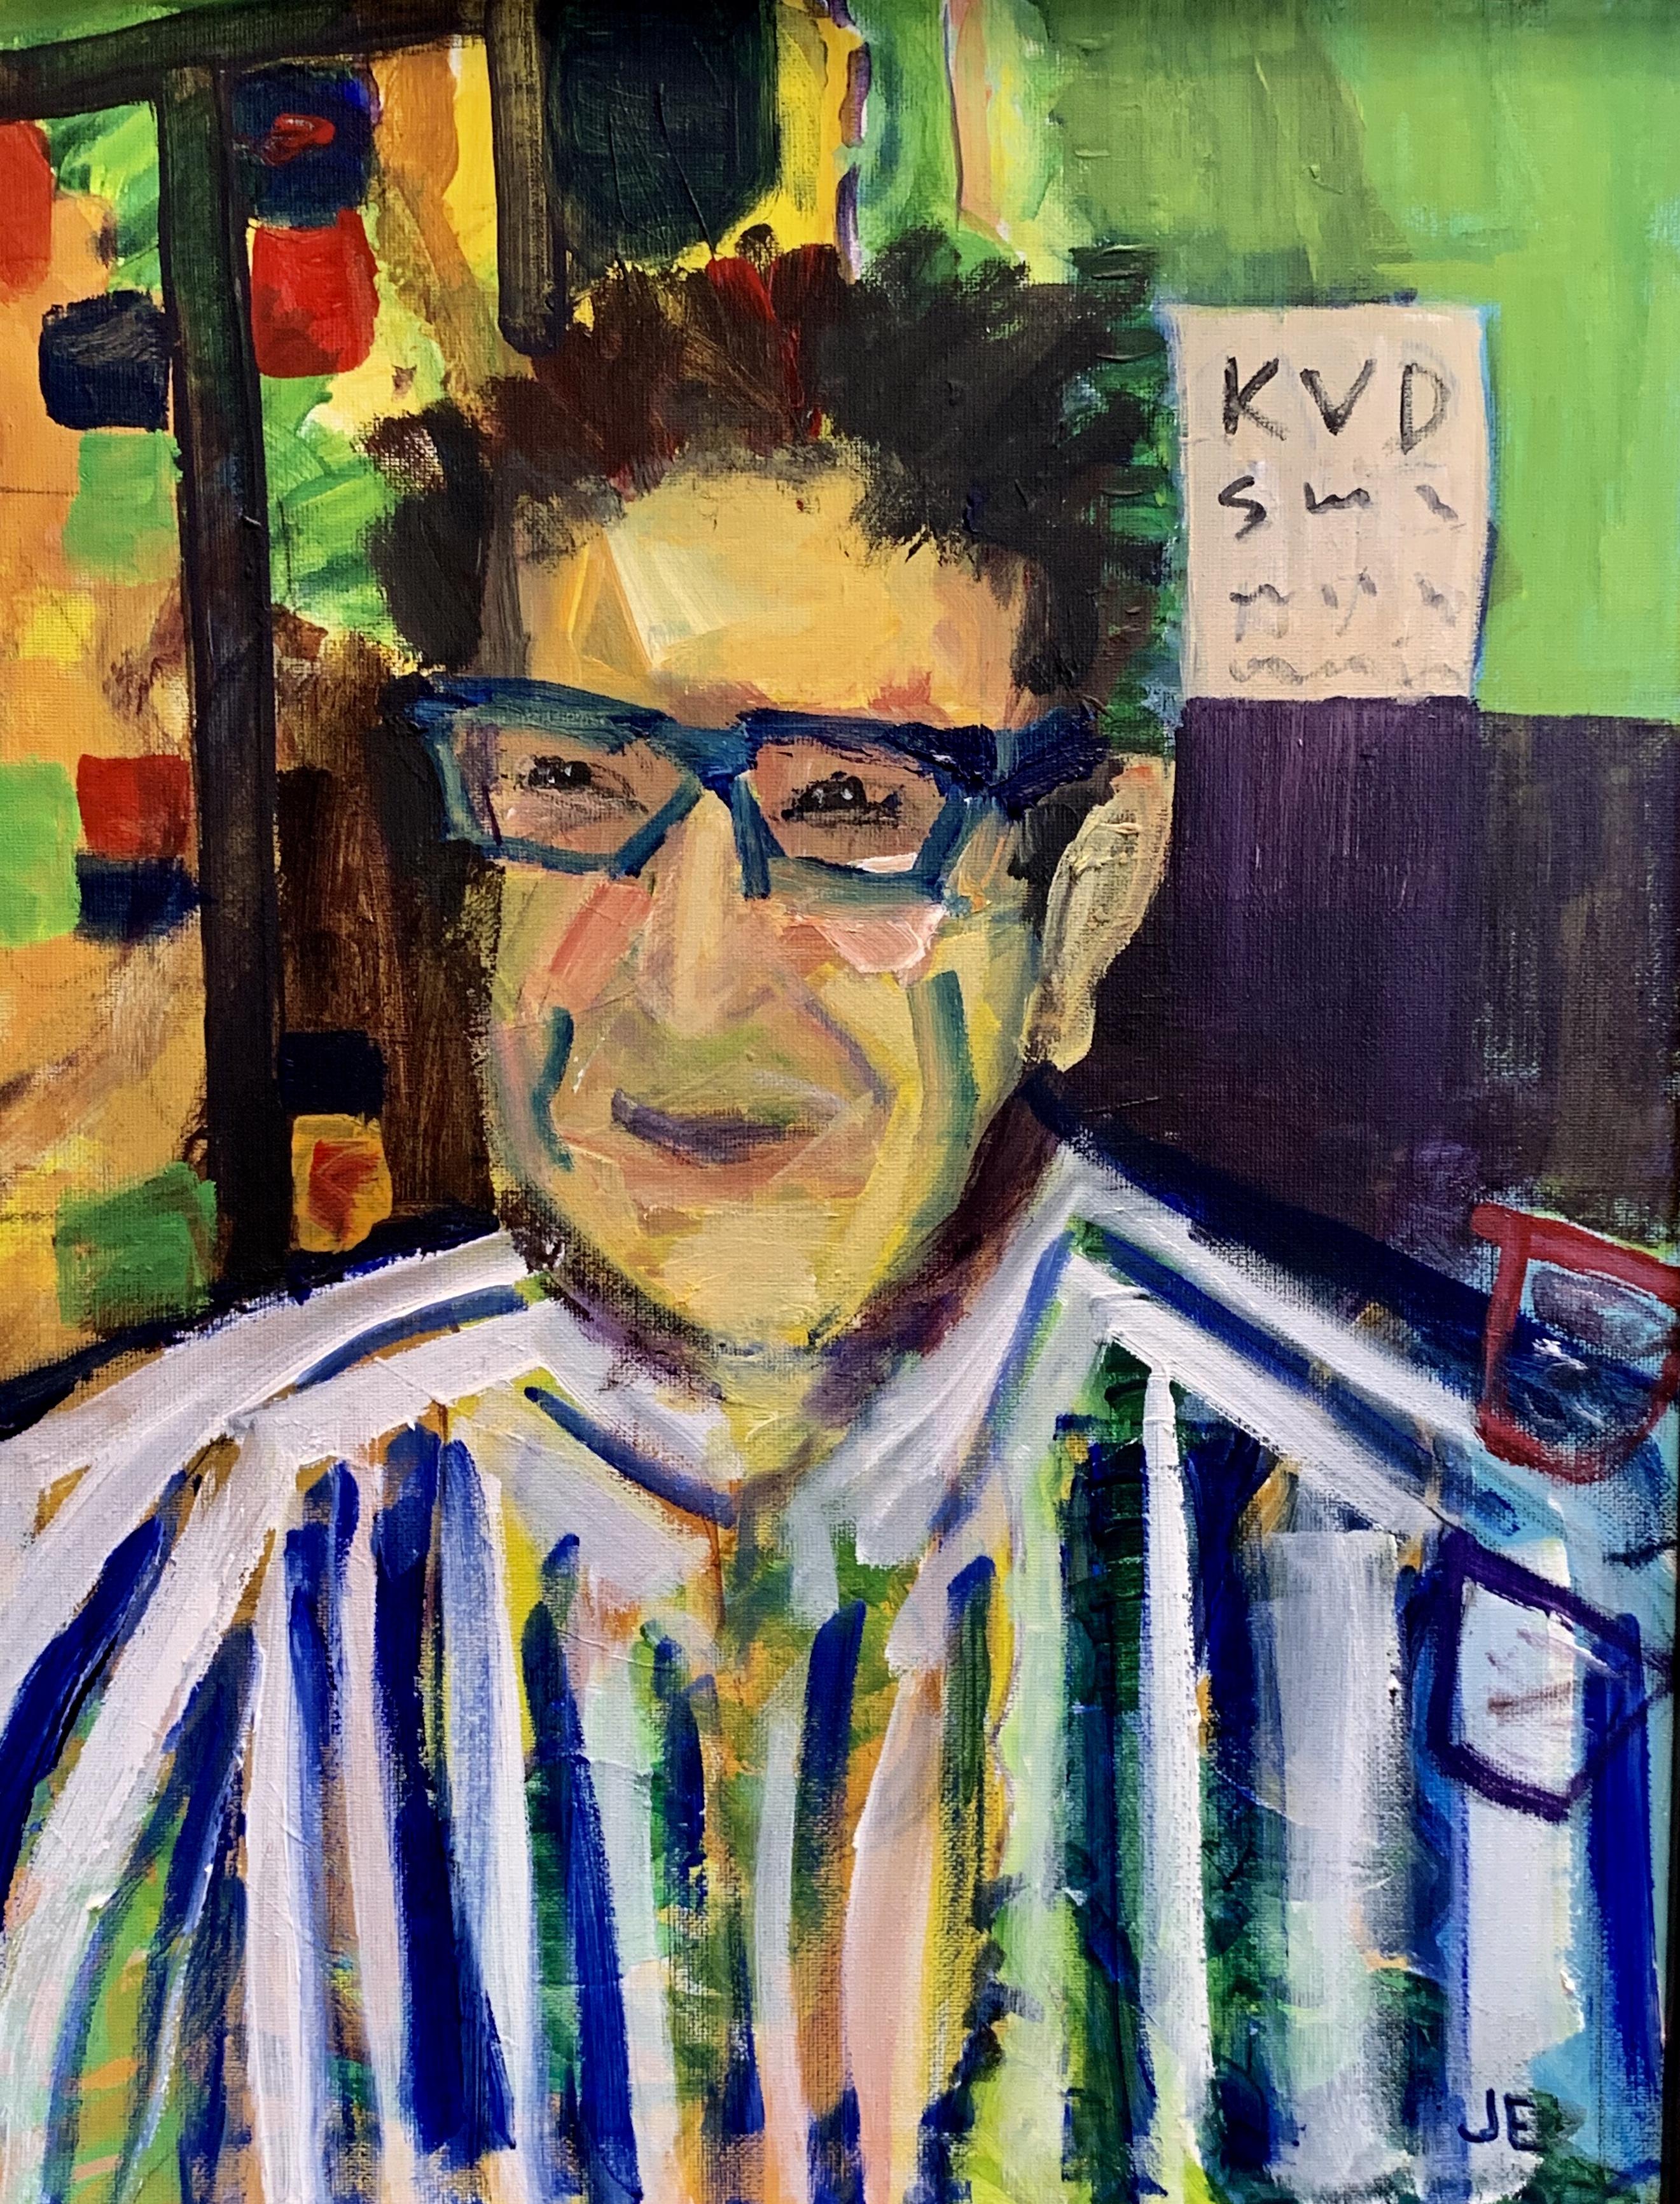 Eric at Styleyes, 20 x 16